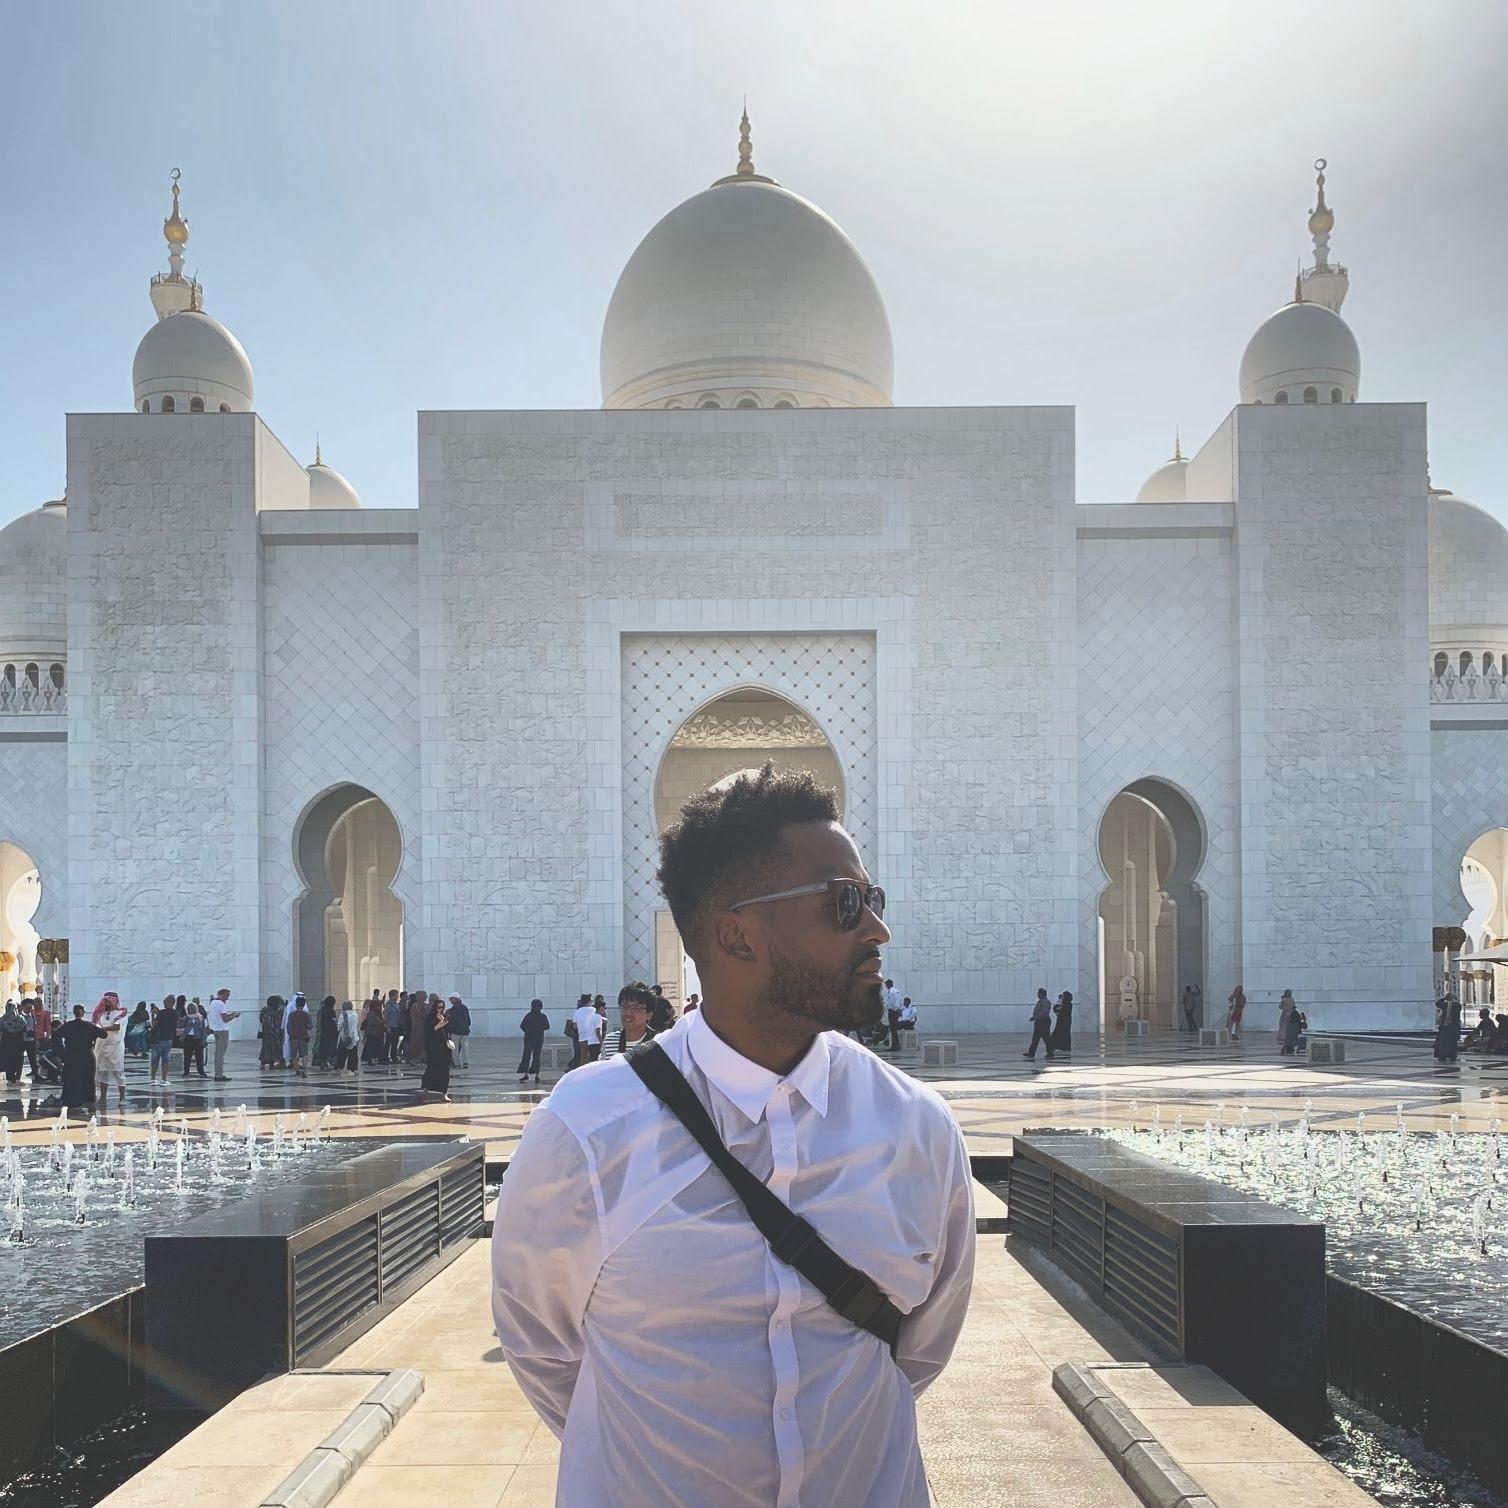 Abu Dhabi - UAE, Sheikh Zayed Grand Mosque Center